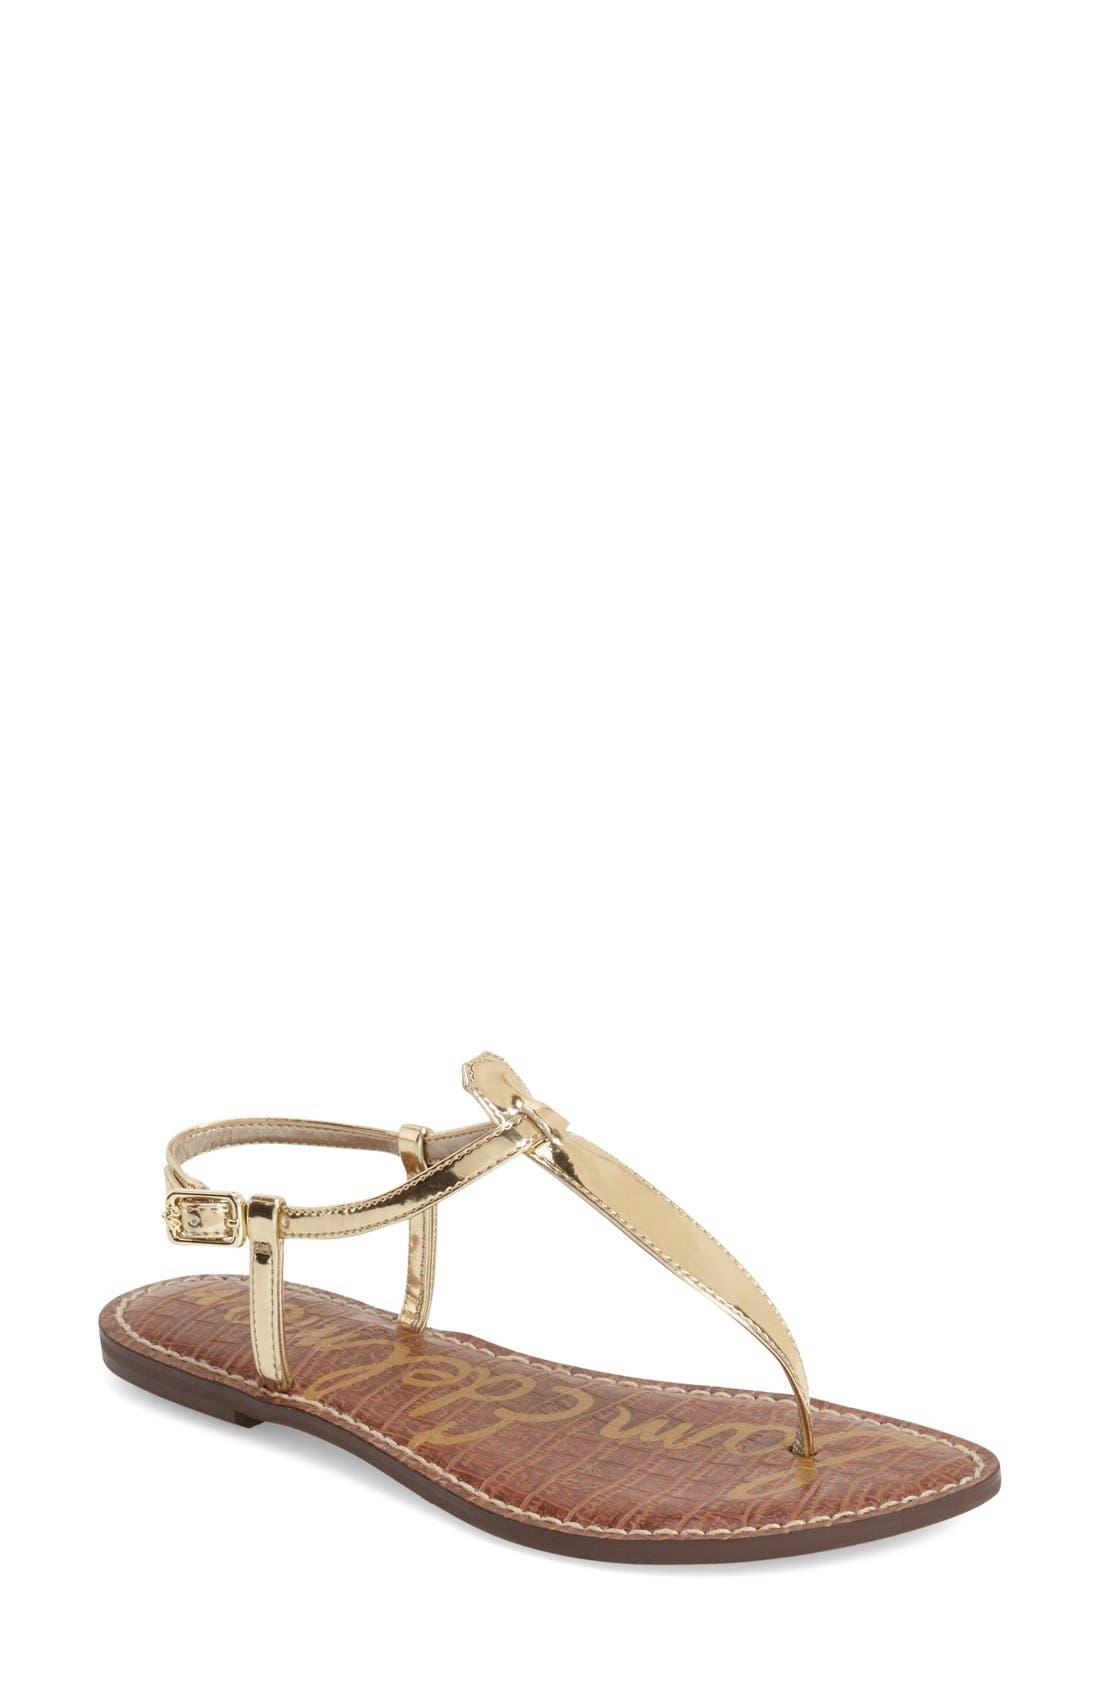 Womens sandals marshalls - Womens Sandals Marshalls 49